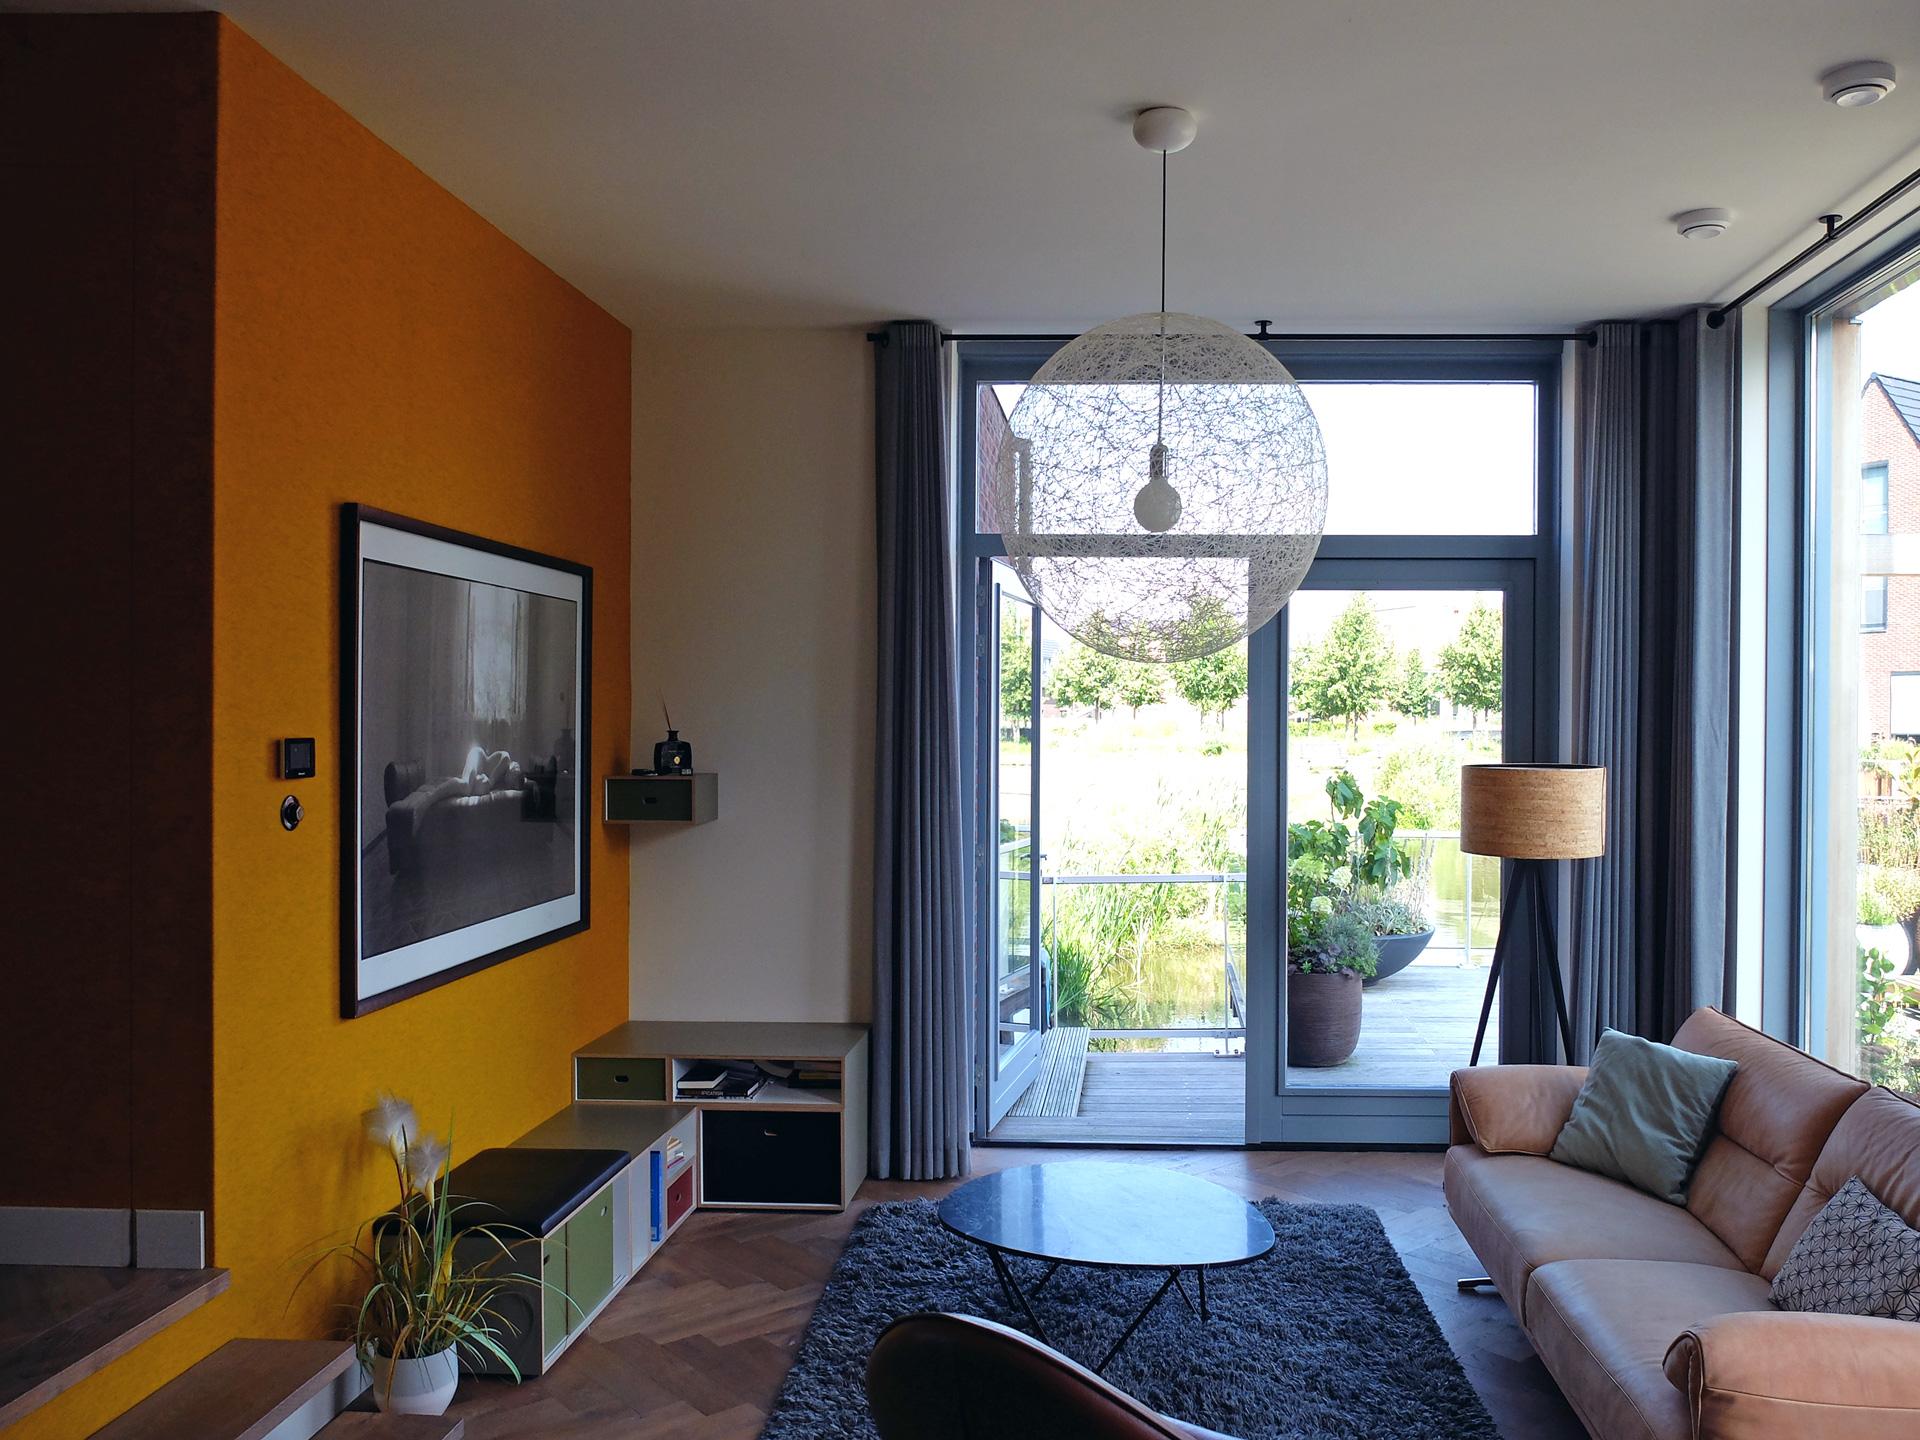 LAGADO-architects-orange-core-living-room-level-felt-residential-interior-at-home